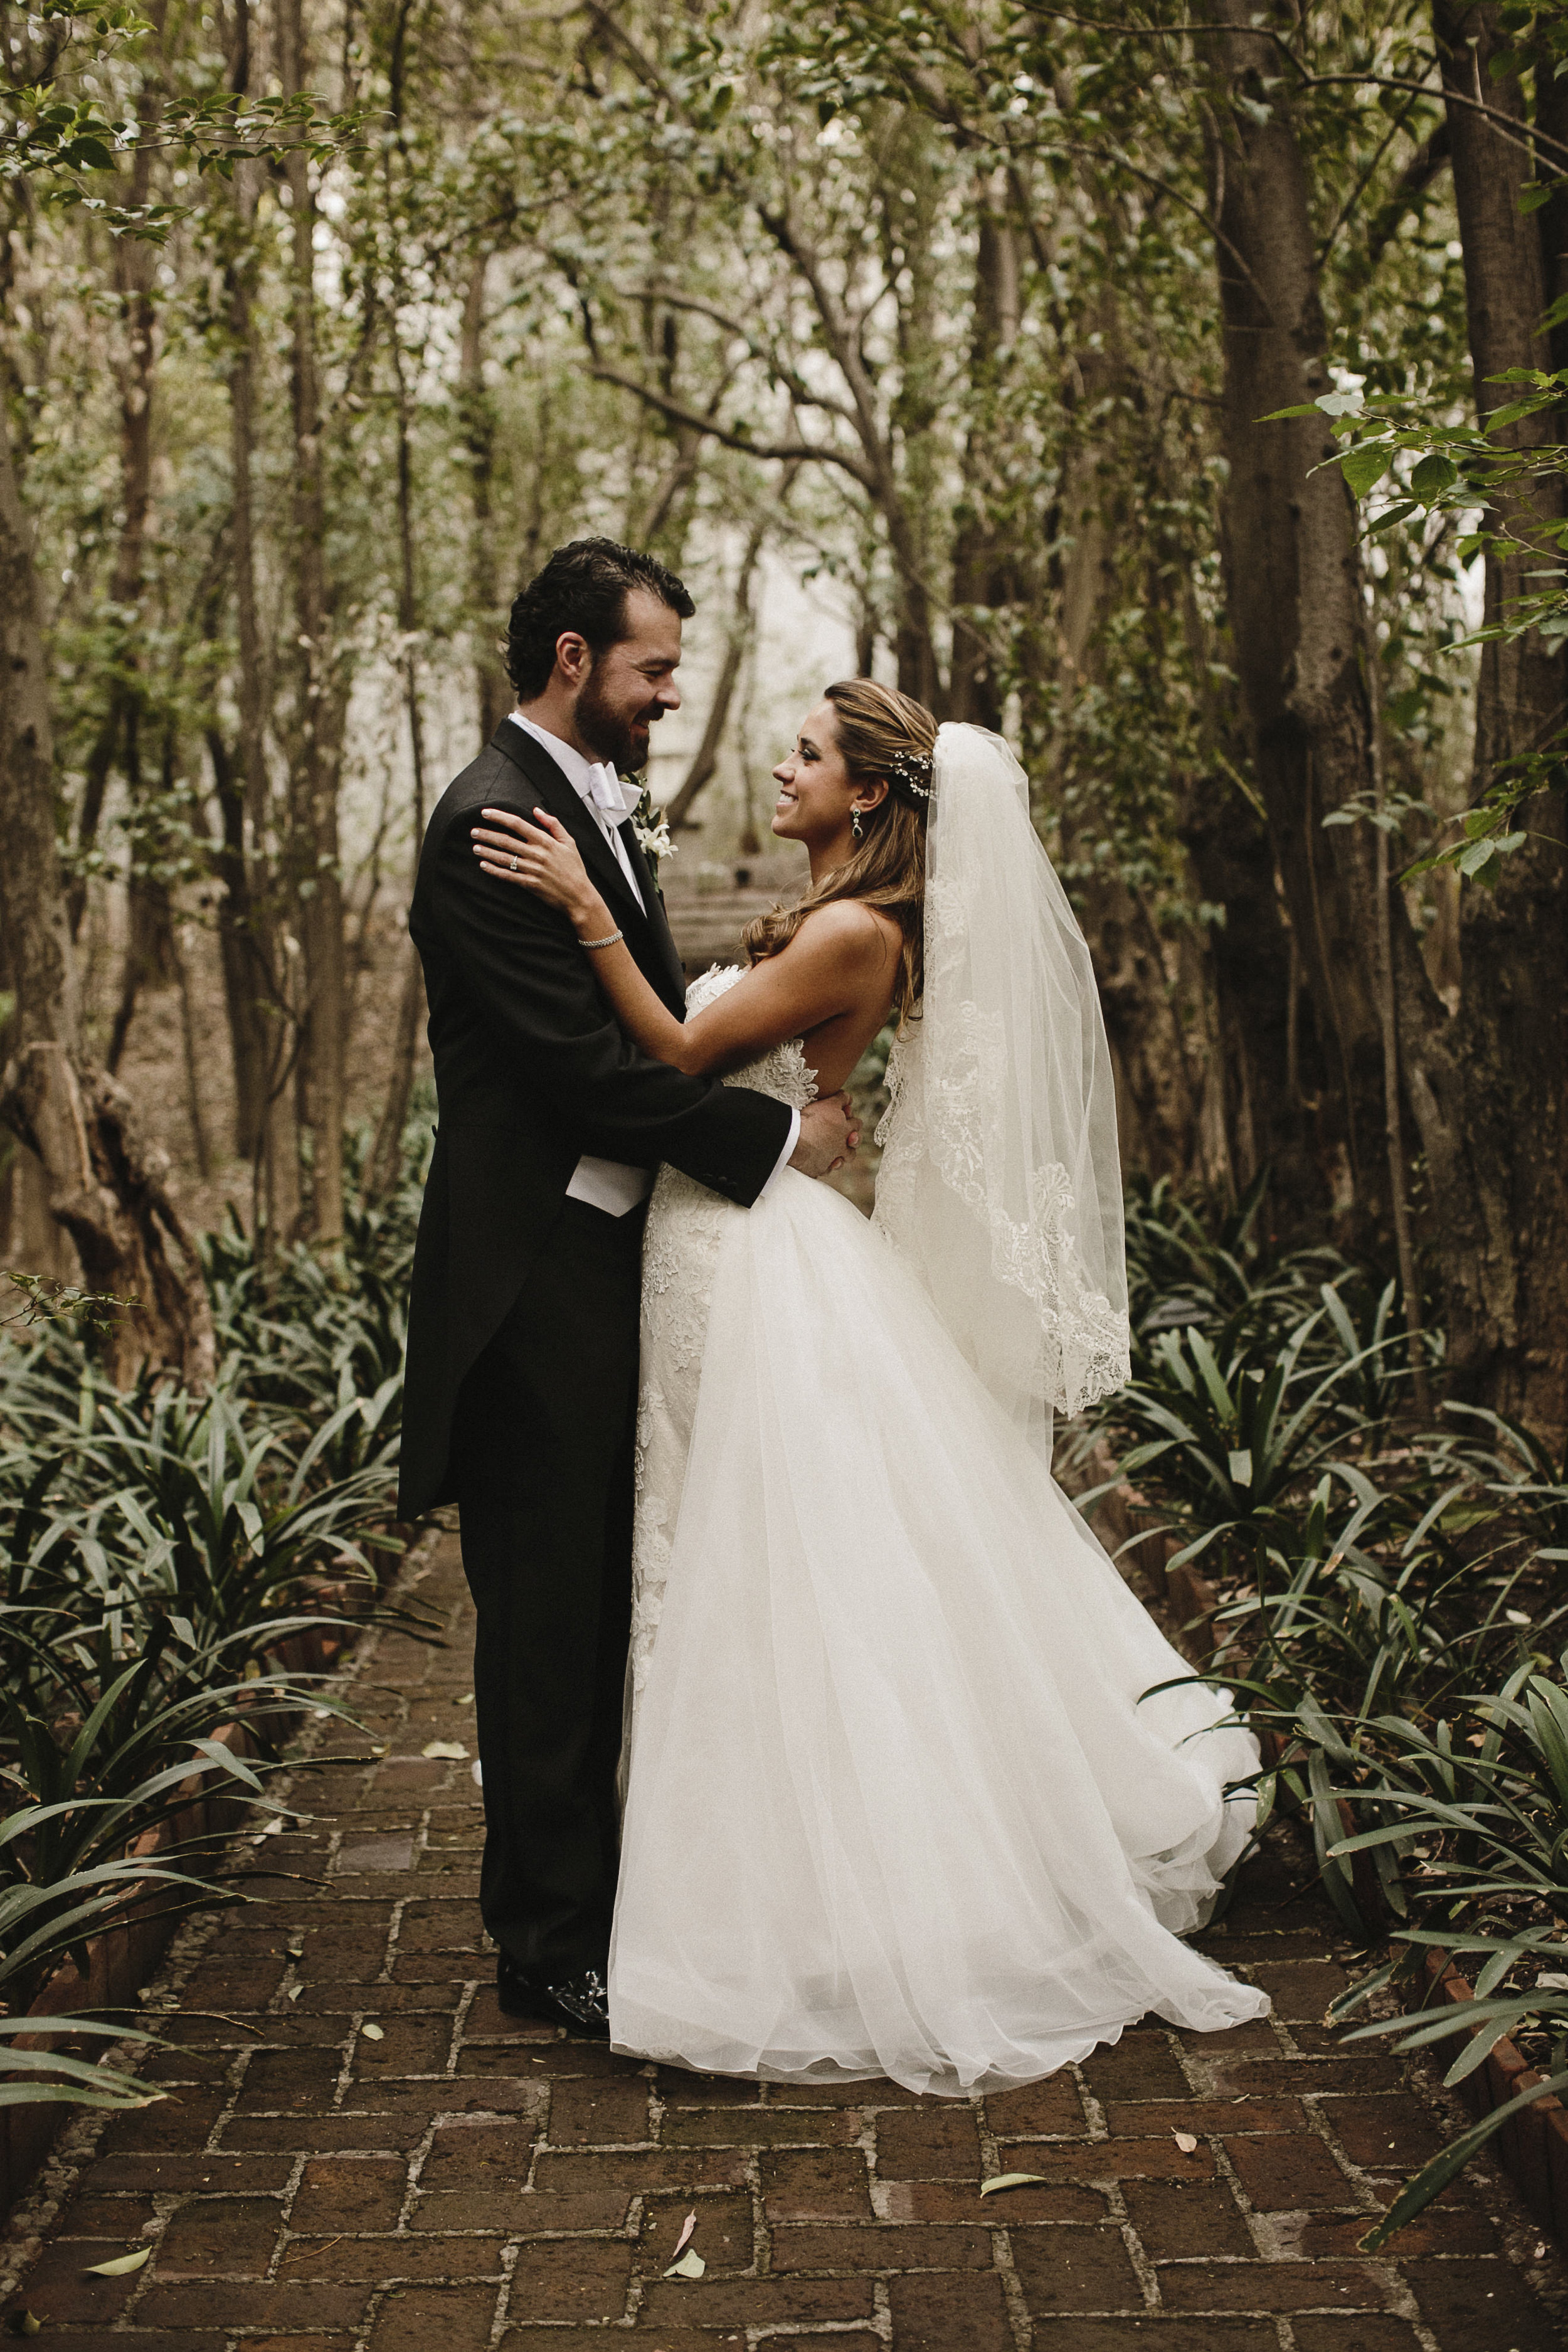 alfonso_flores_destination_wedding_photogrpahy_paola_alonso-243.JPG